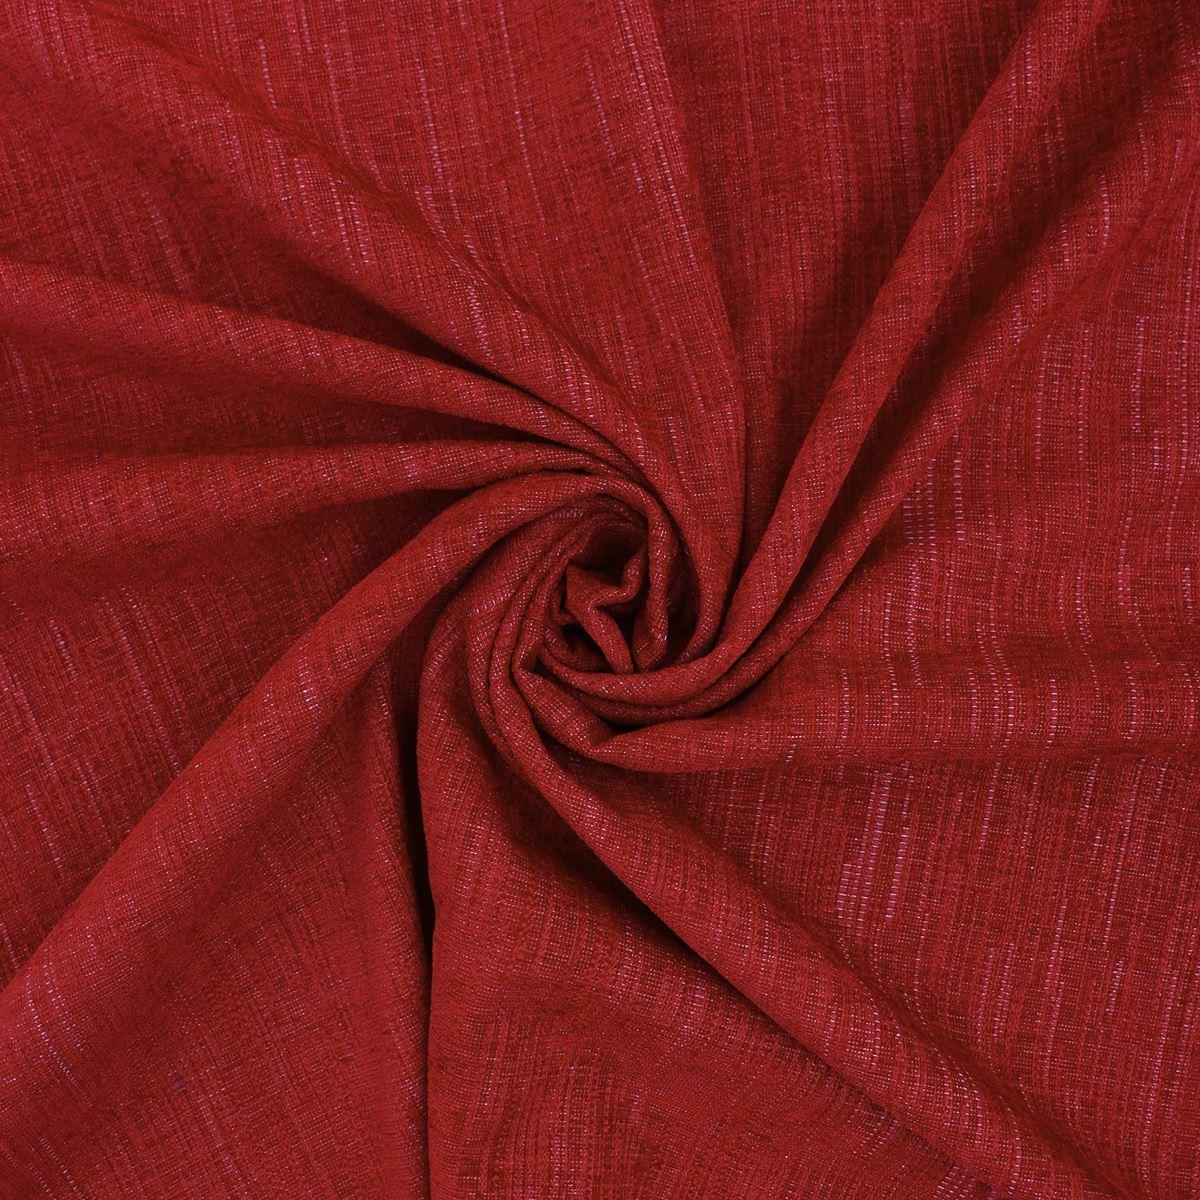 034-Chenille-034-Slubbed-Shabby-Worn-Look-Curtain-Cushion-Sofa-Upholstery-Fabric thumbnail 66